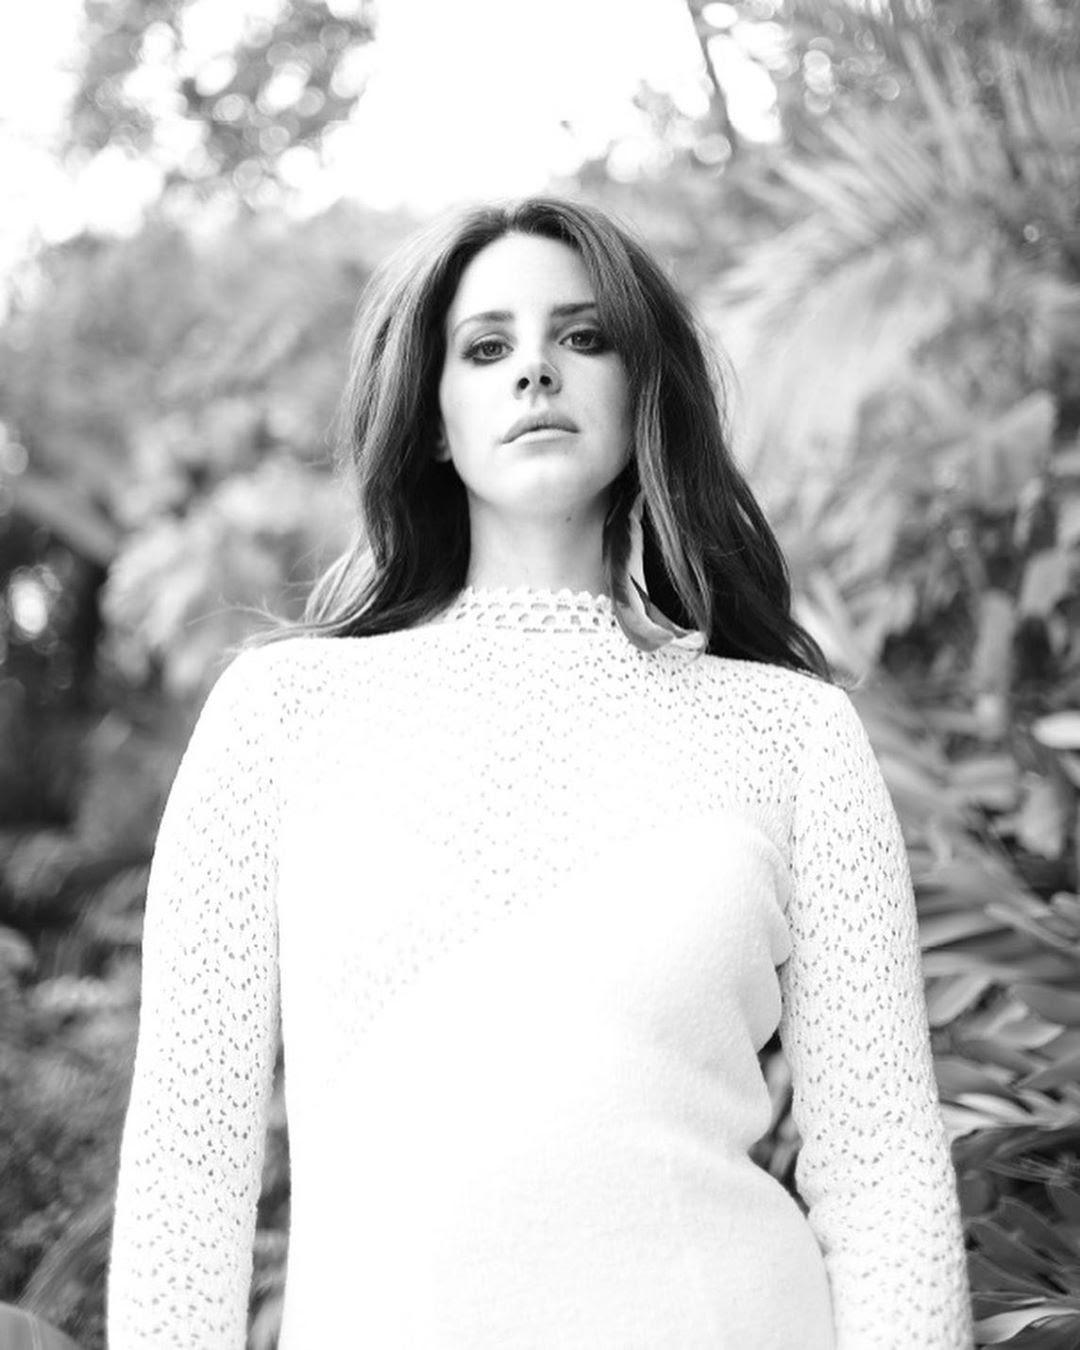 Lana del Rey New Libération photoshoot pic leaks ...